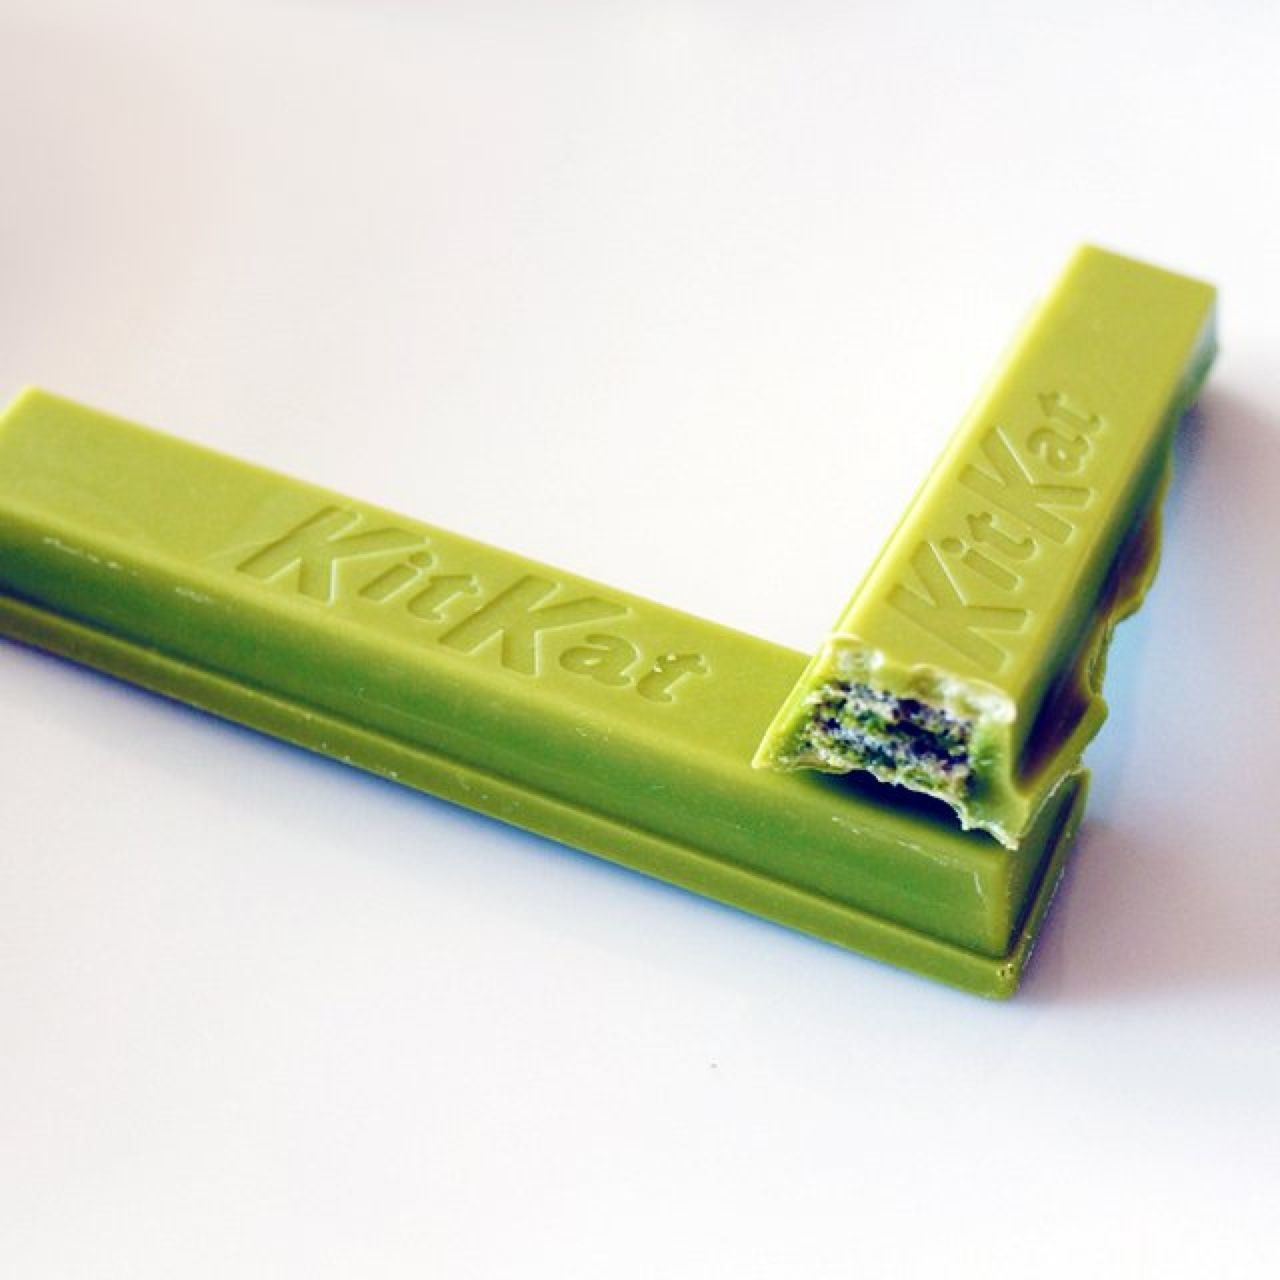 Whaaaa!!!! A green tea Kit Kat! I WANT THIS NOW!